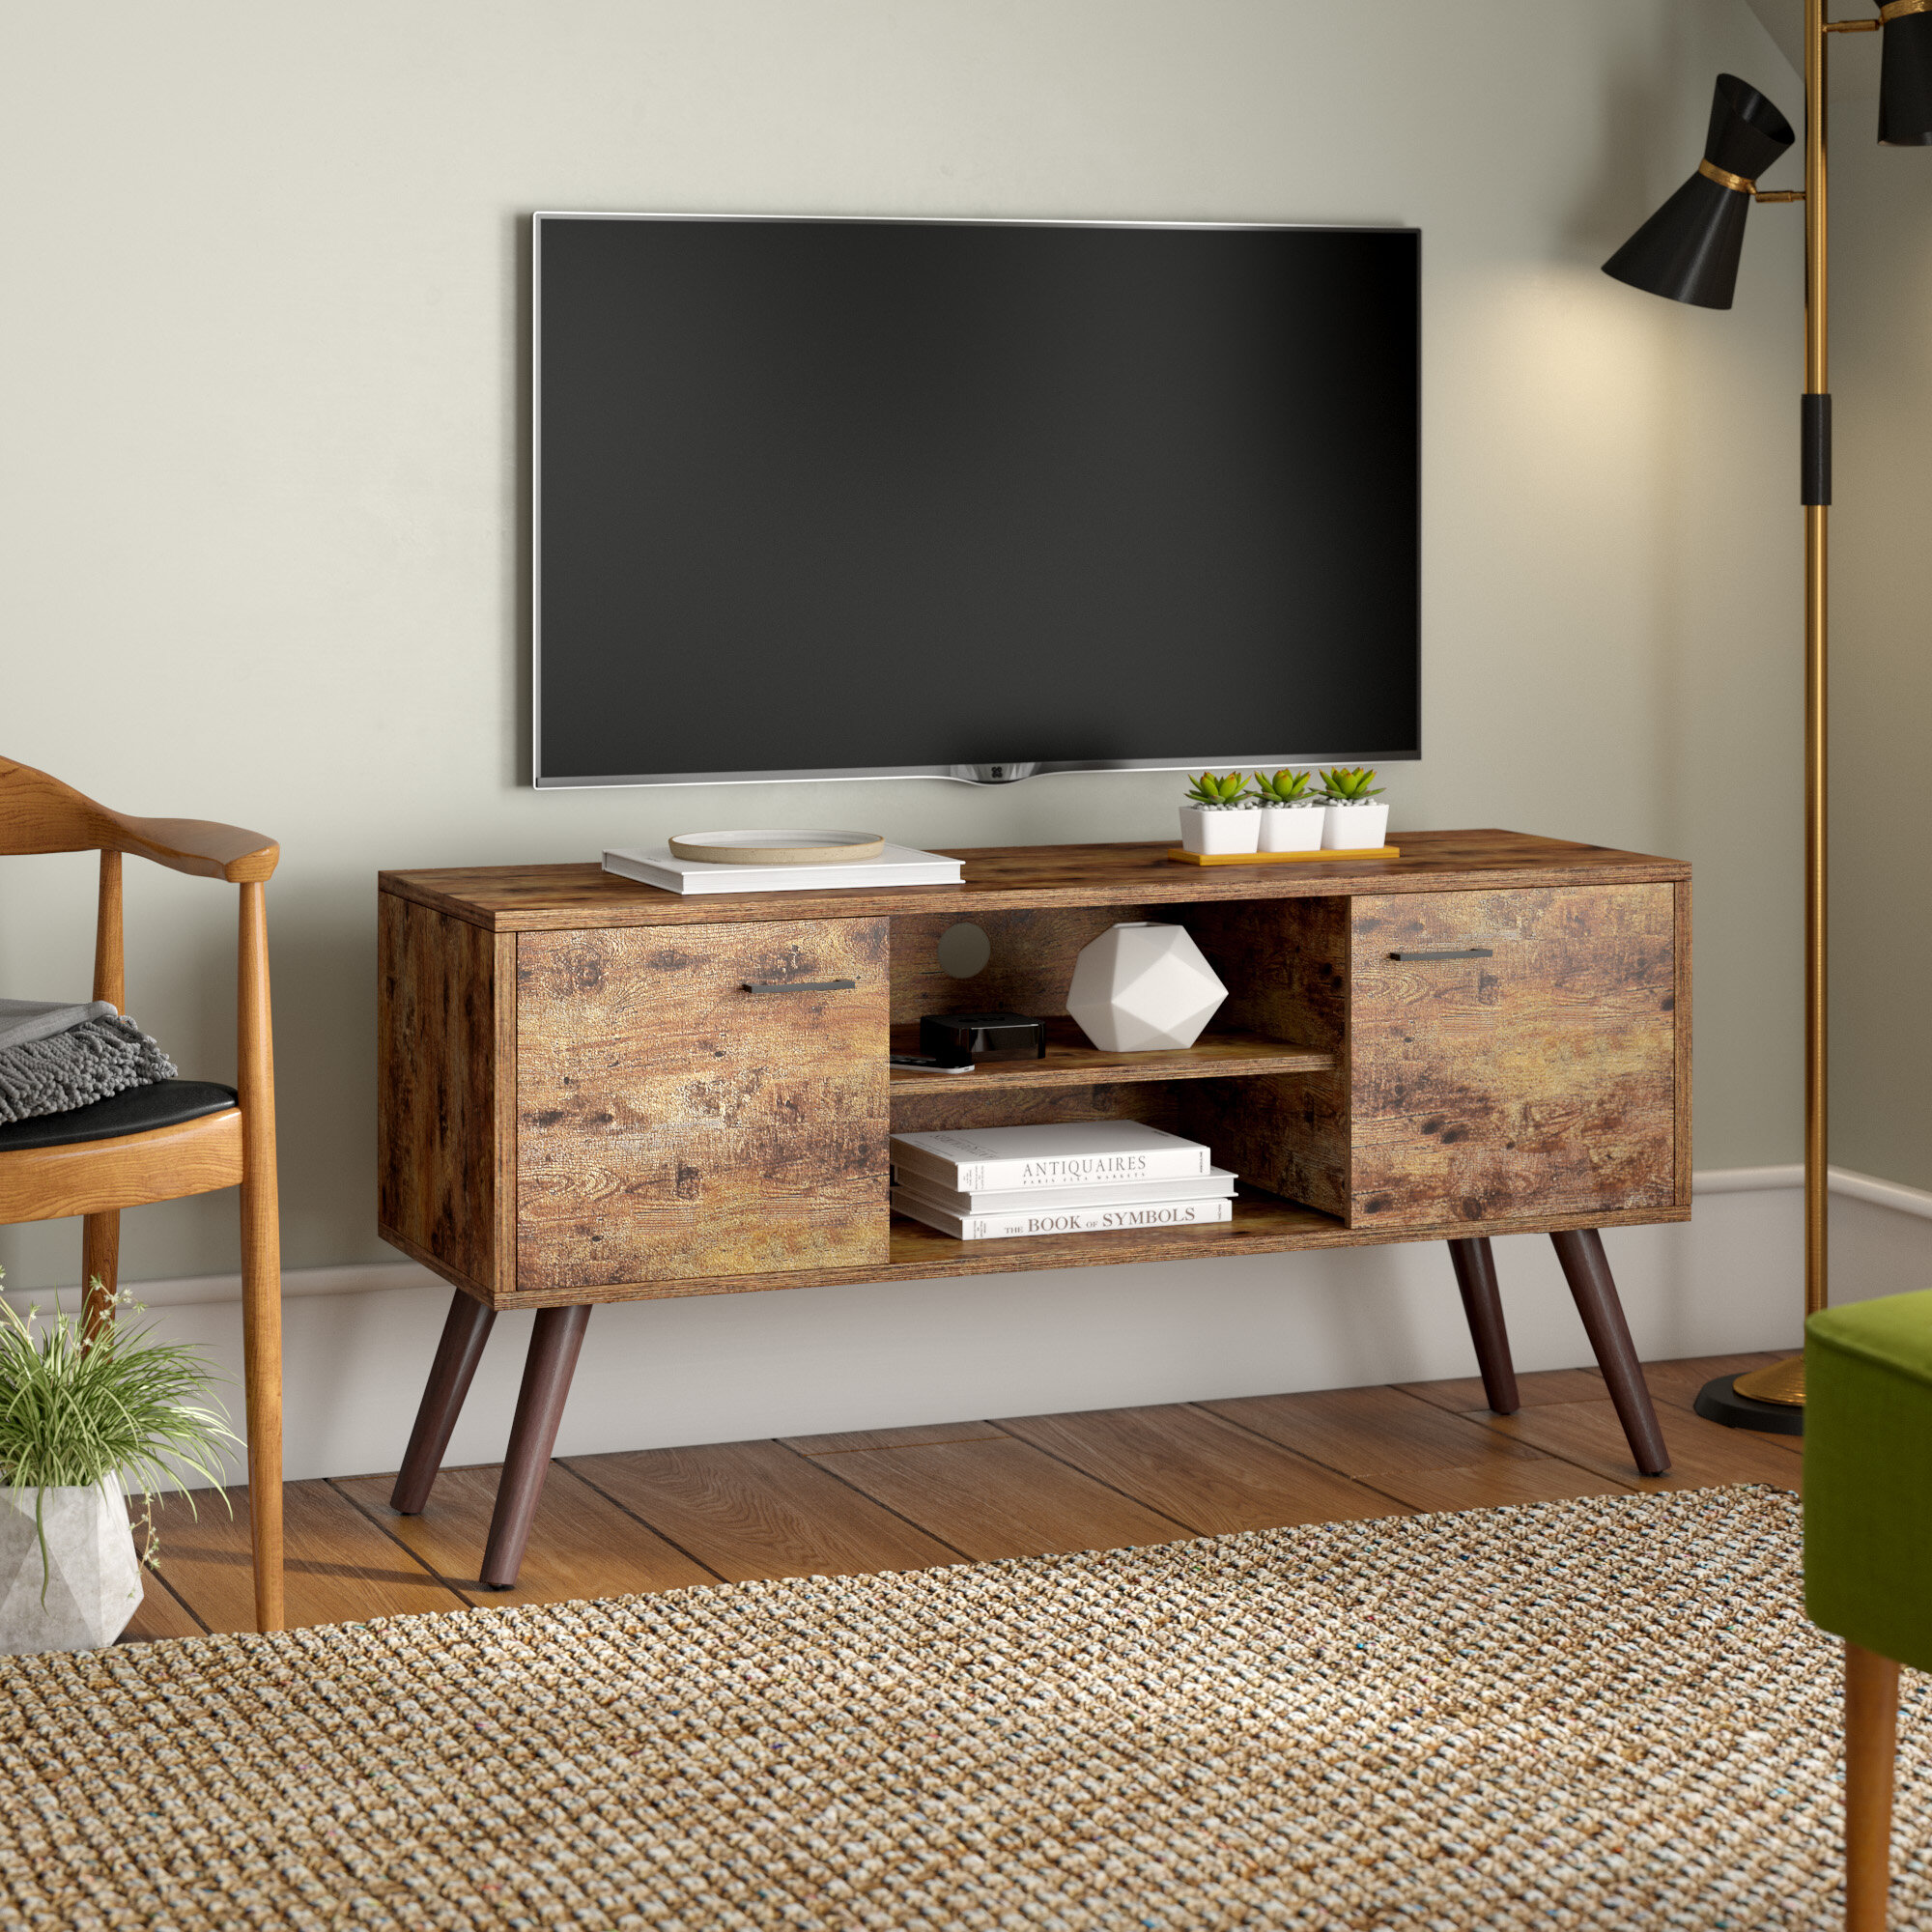 Tv Stand Modern Designs : Don t miss this deal paris contemporary design wall unit modern